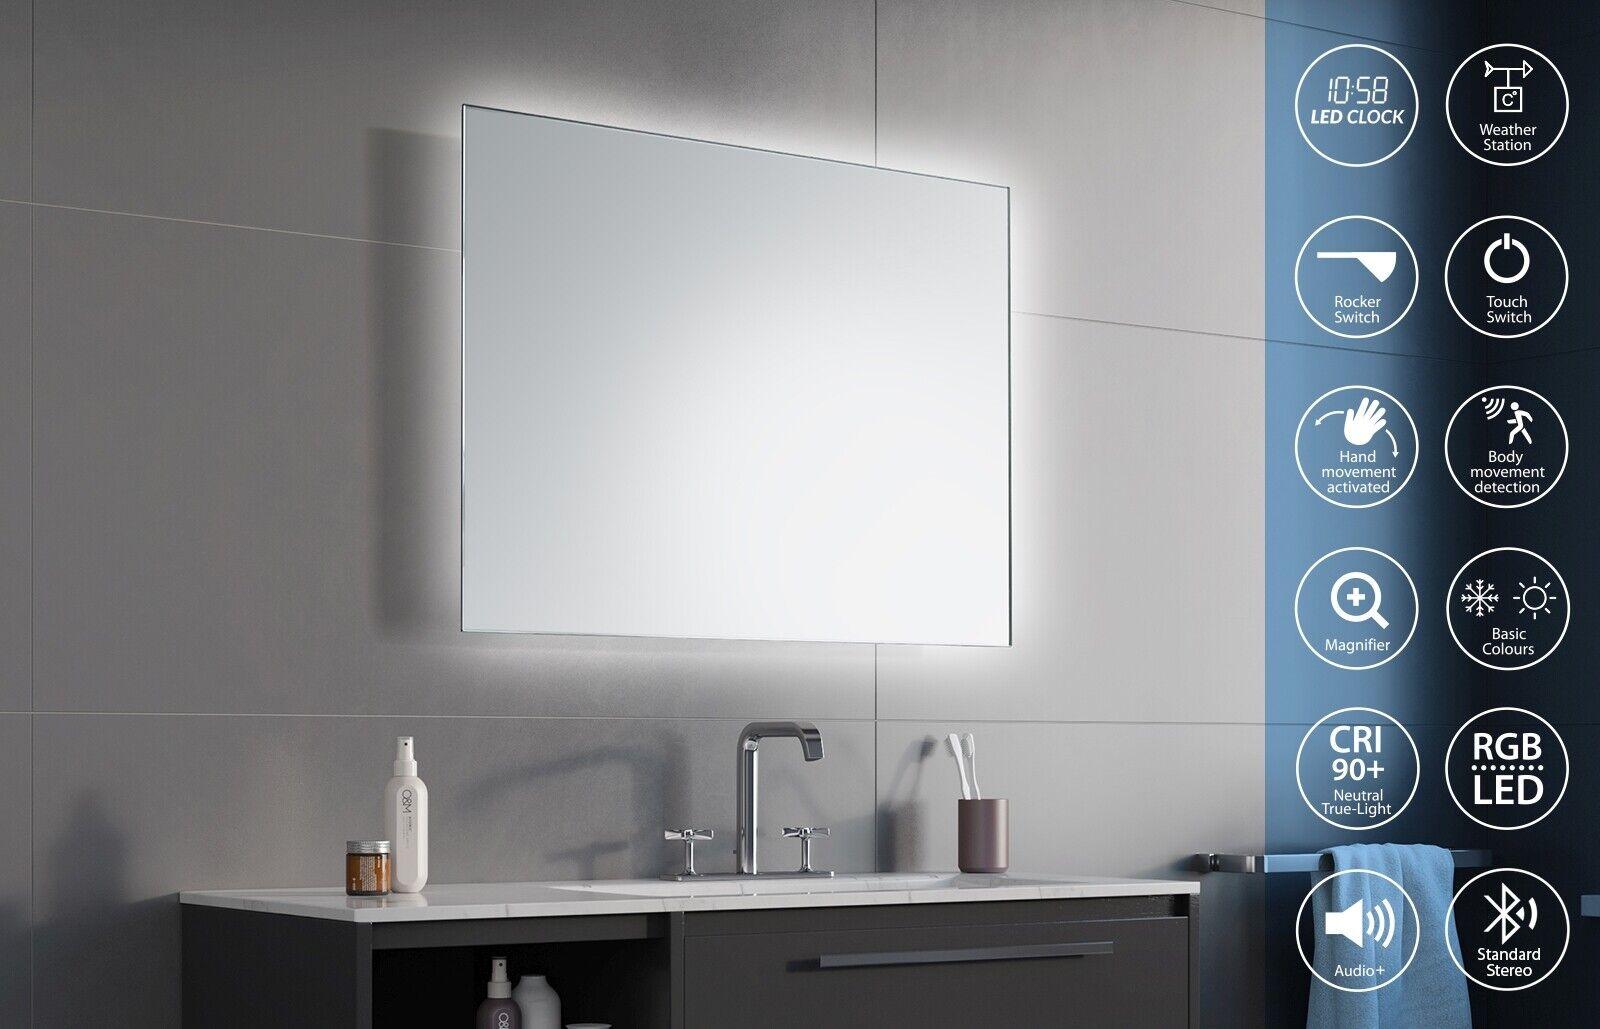 Badspiegel LED Beleuchtung LED-Uhr Blautooth Makeup Kosmetikspiegel